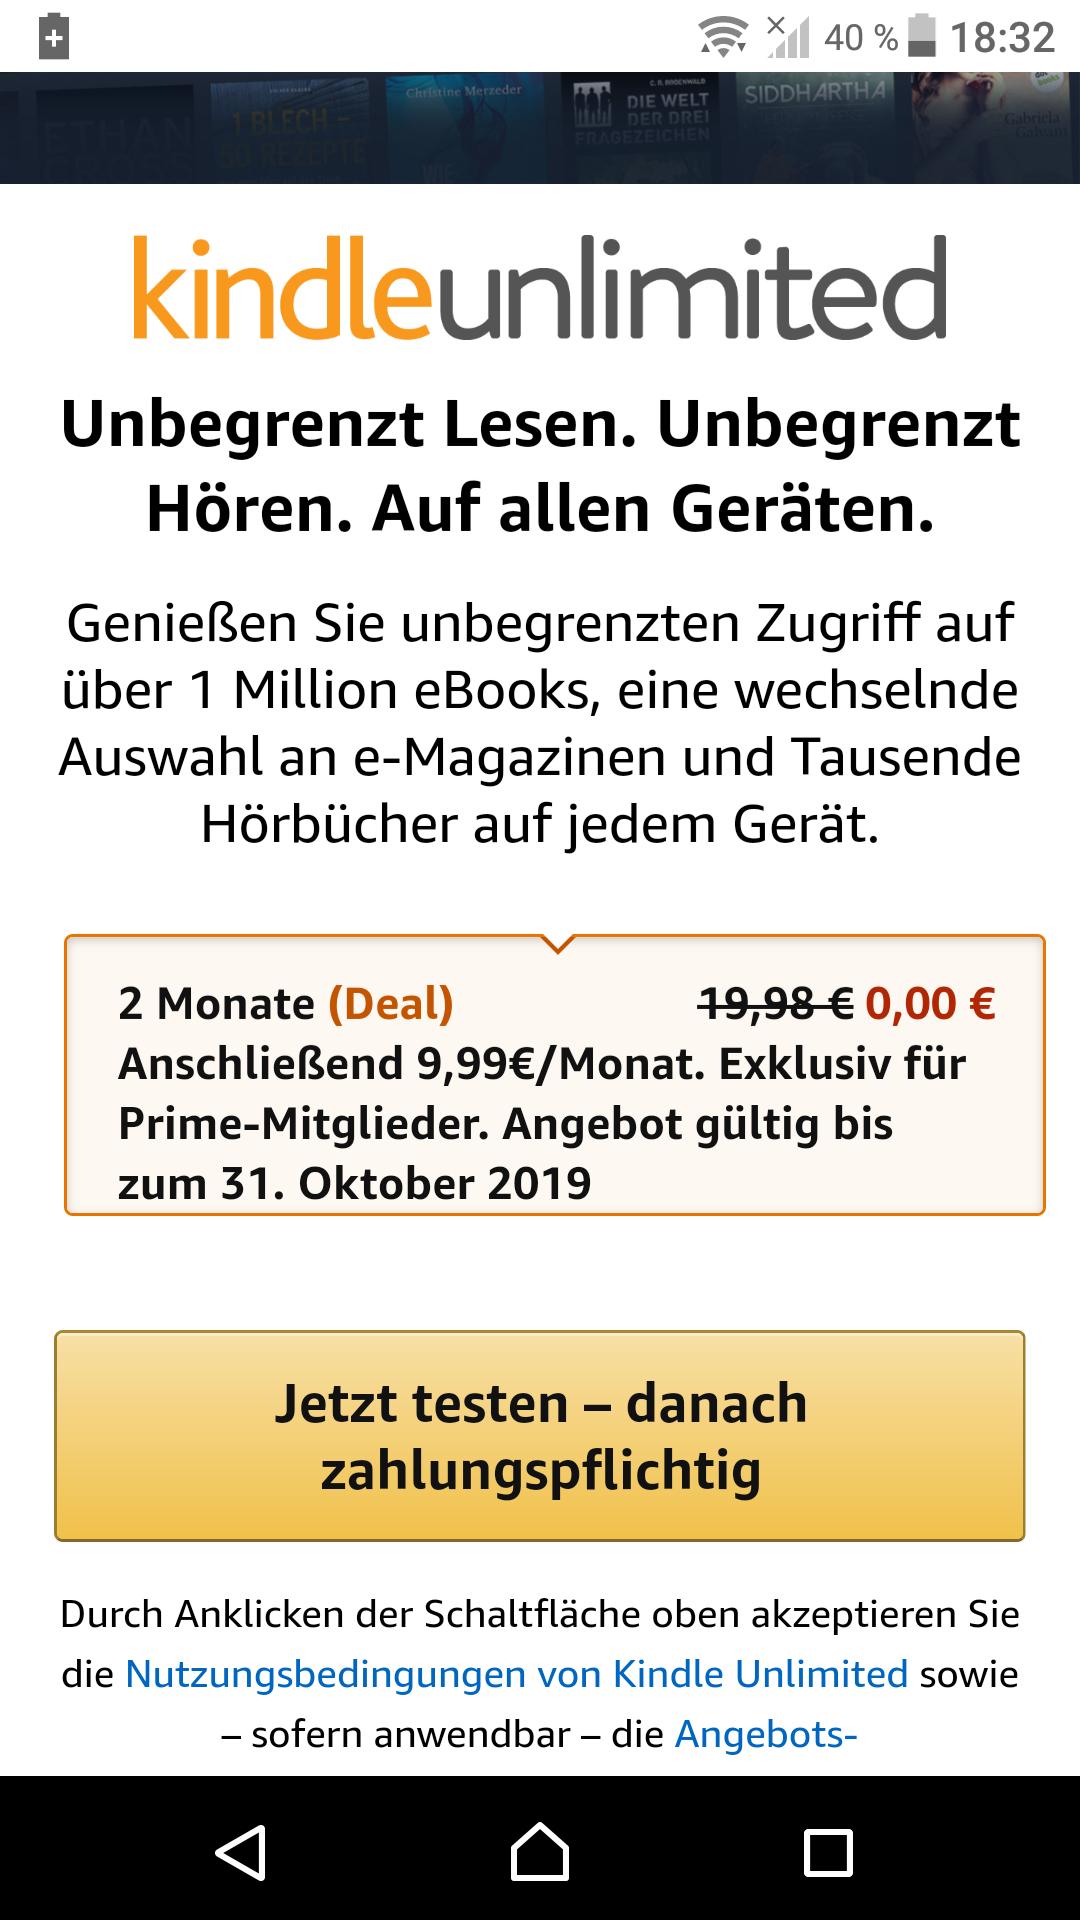 2 Monate gratis KindleUnlimited testen